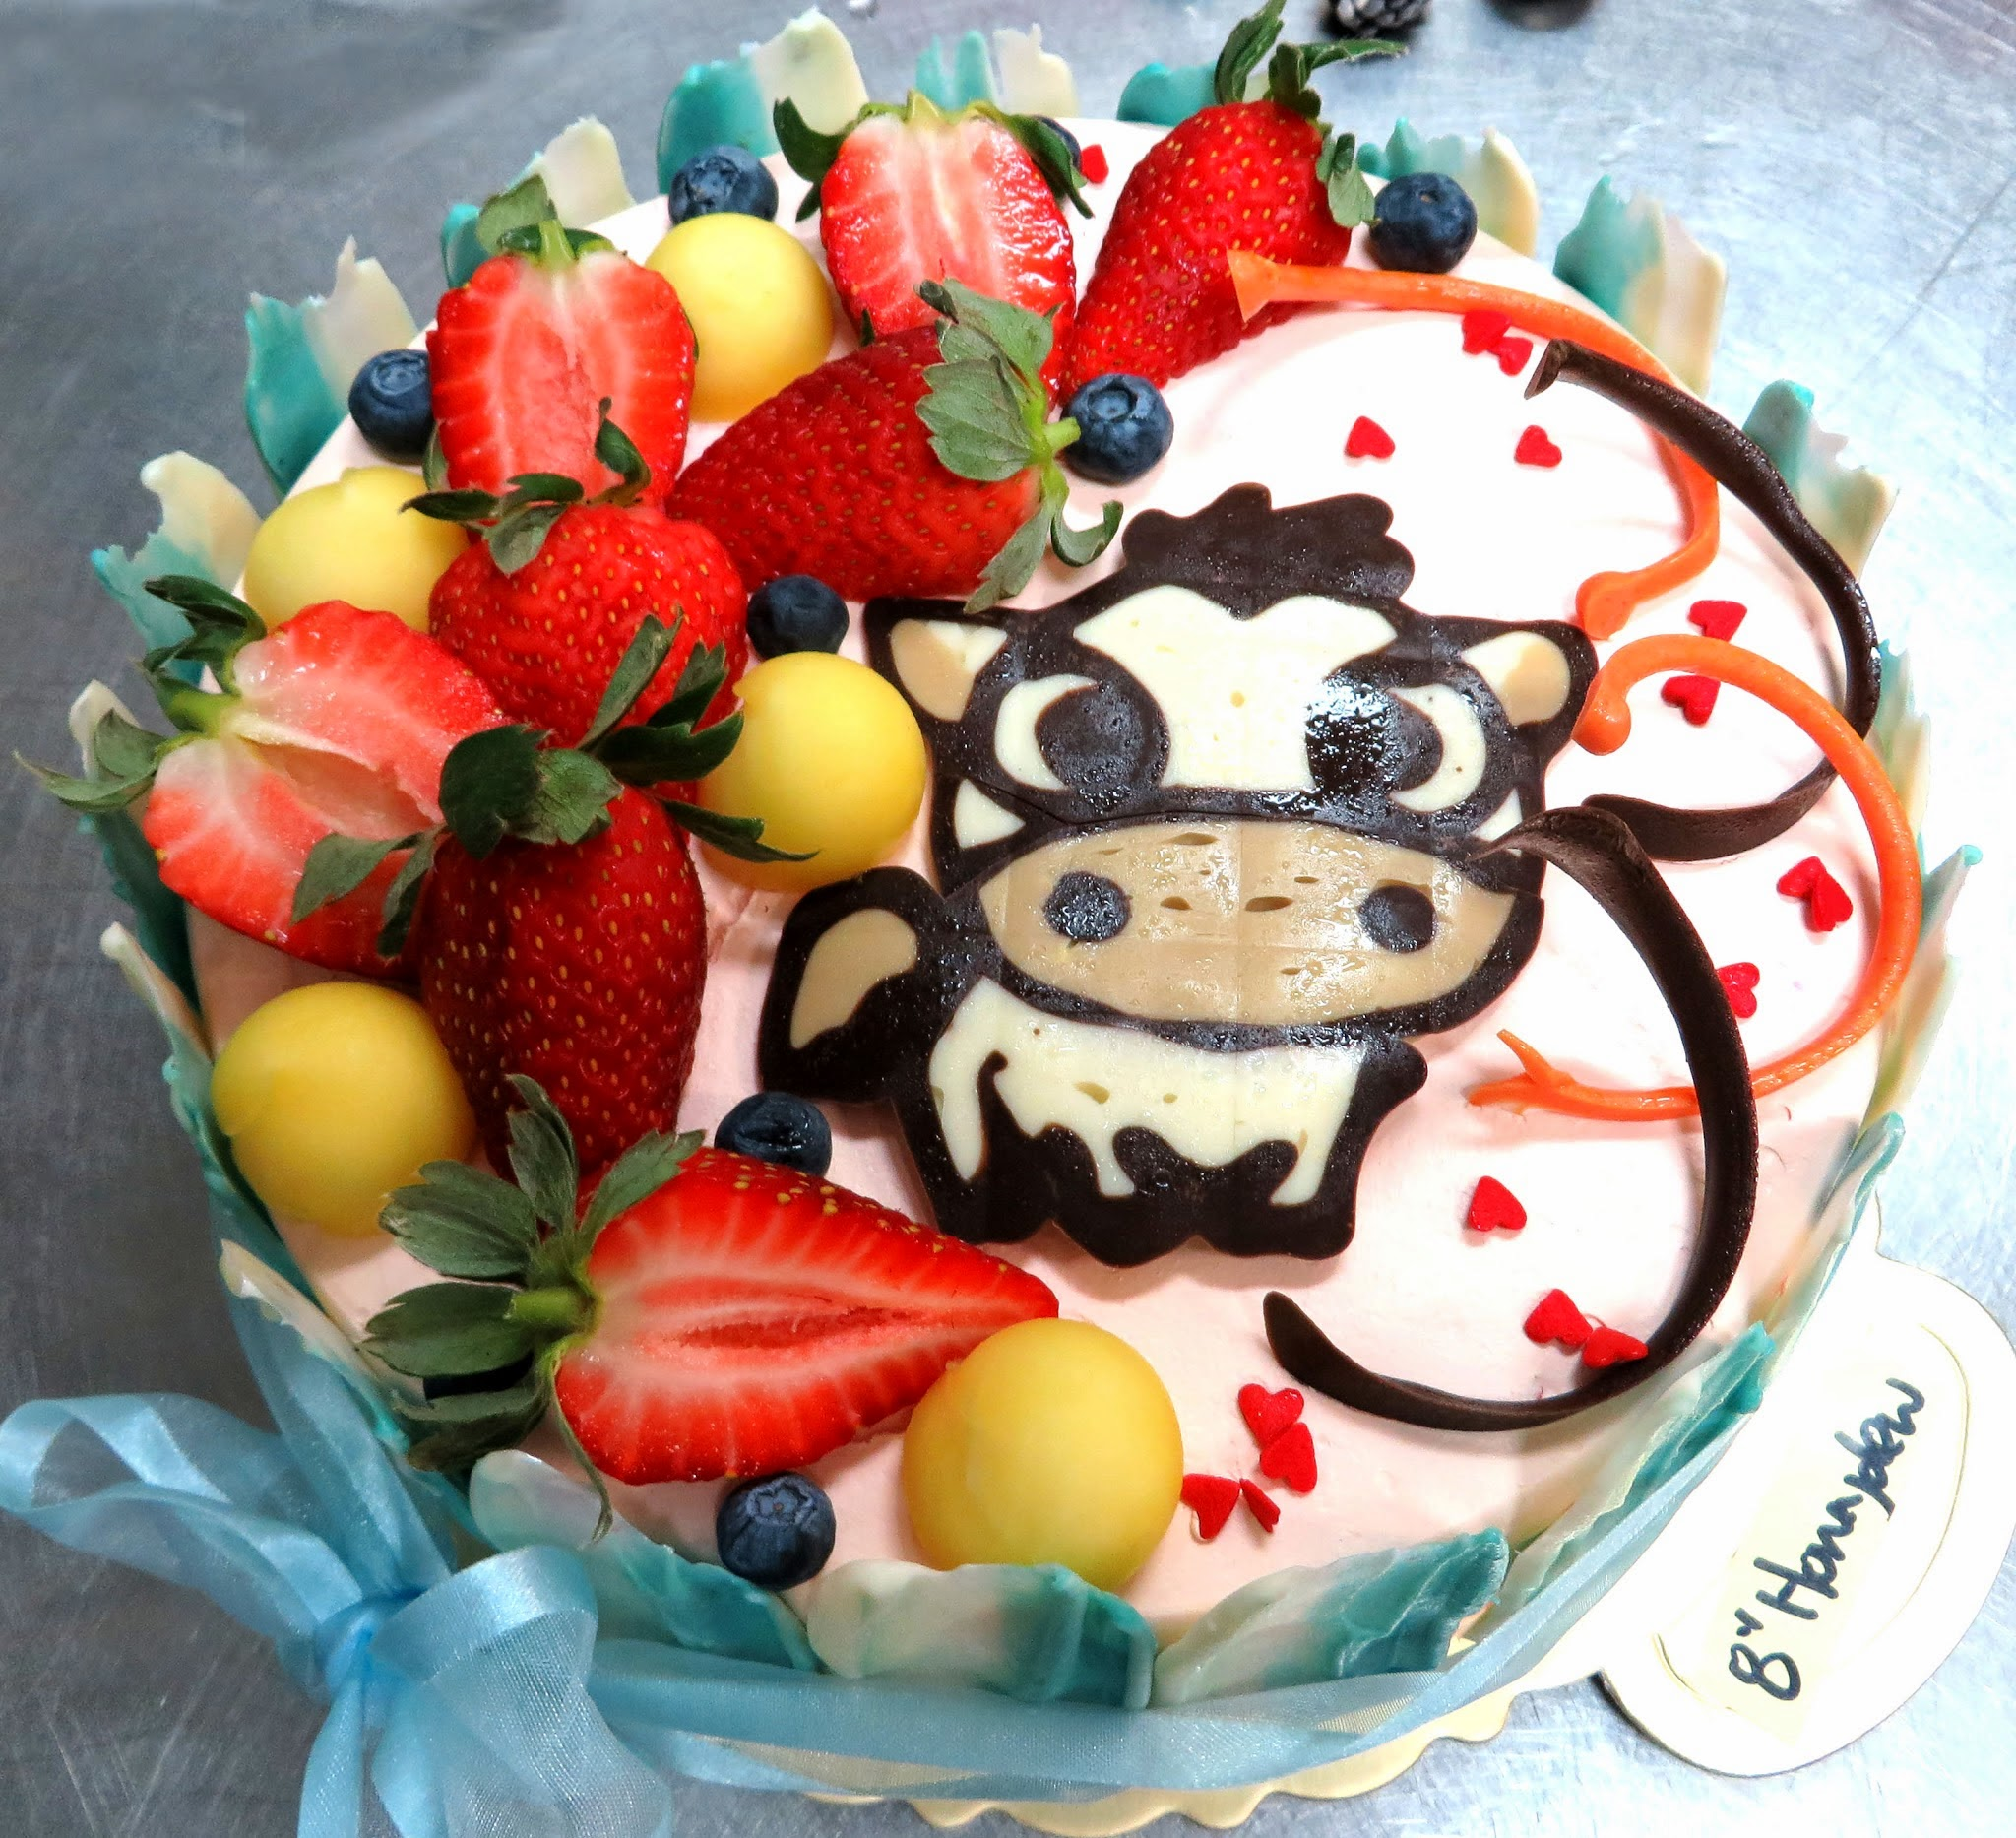 FileGelato Cup Icecream Cake Cowjpg Wikimedia Commons